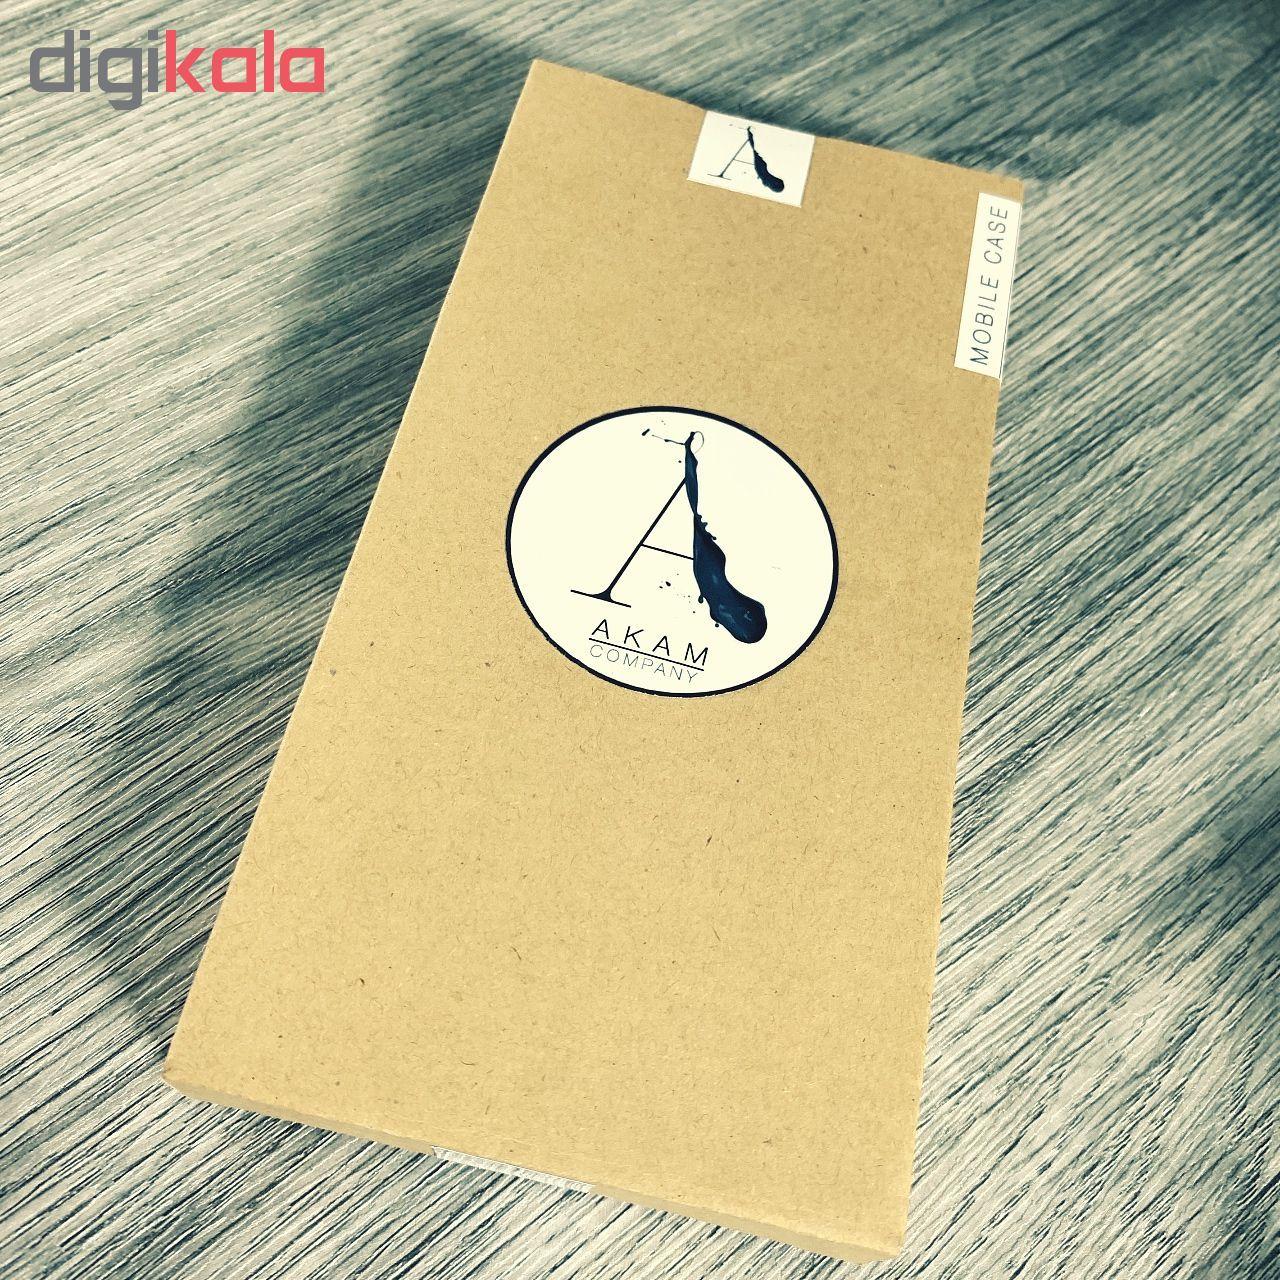 کاور آکام مدل A7P1352 مناسب برای گوشی موبایل اپل iPhone 7 Plus/8 plus main 1 2